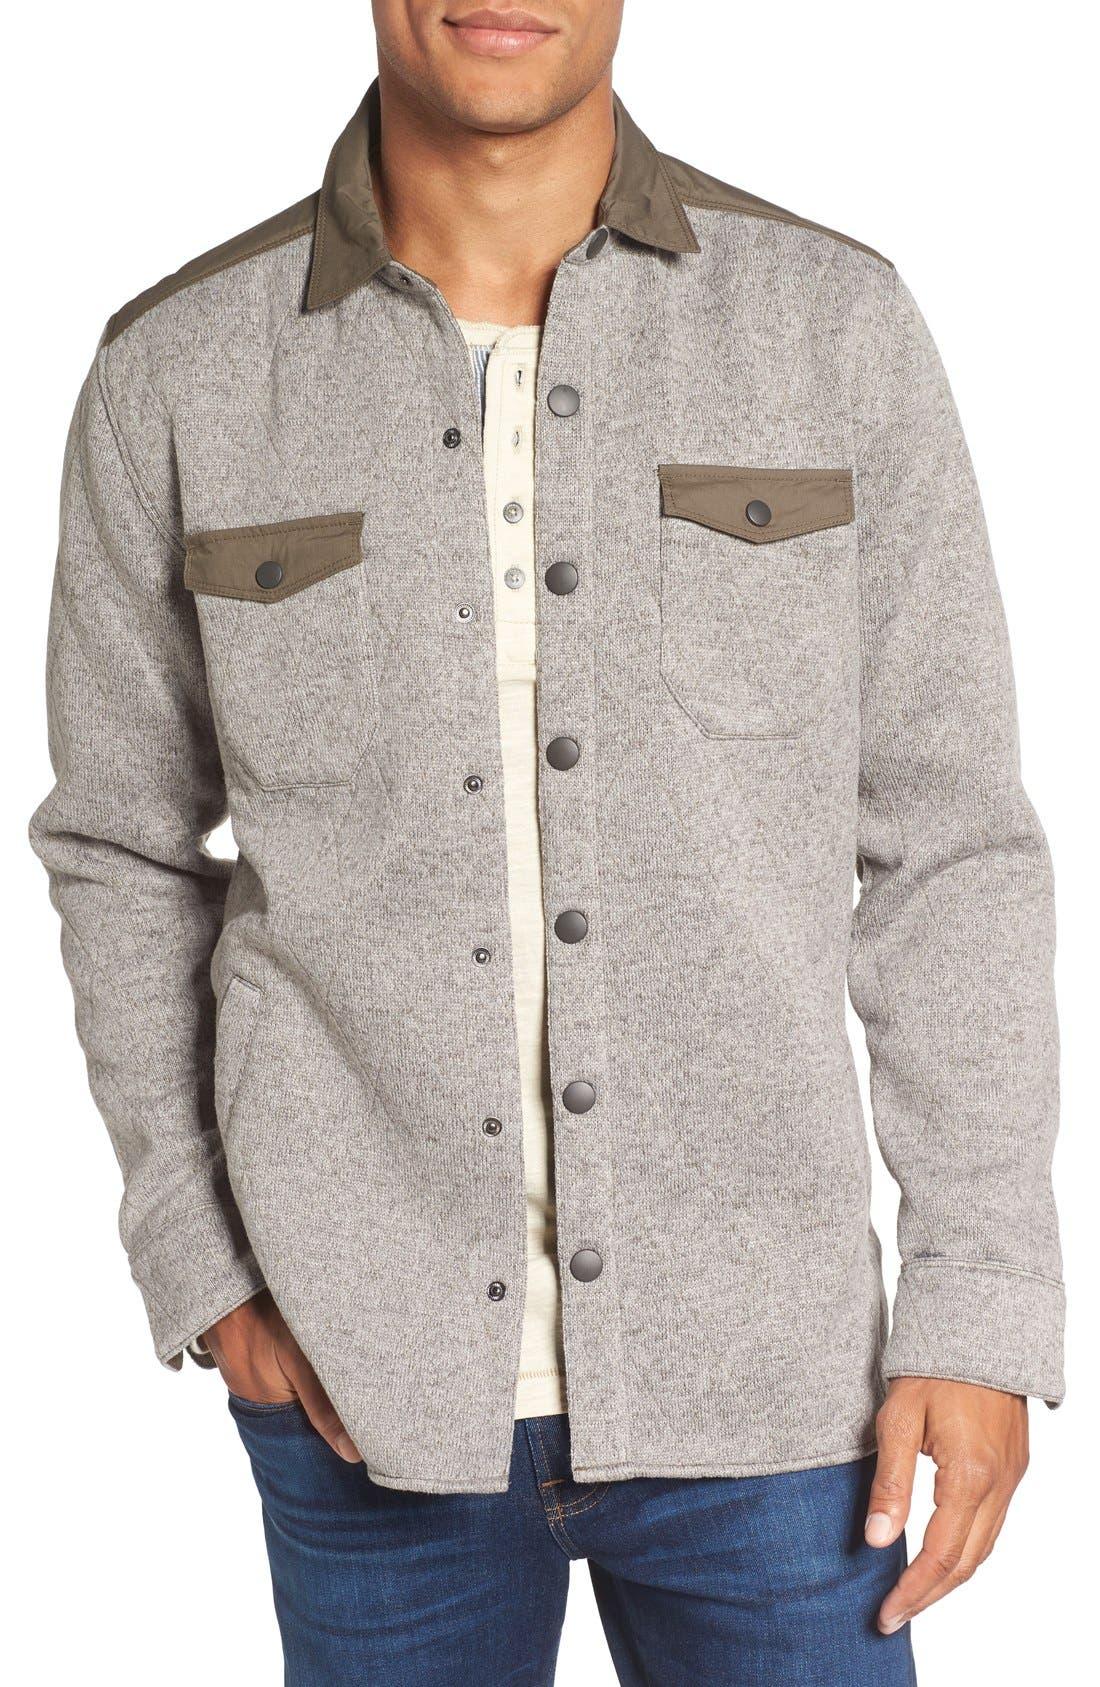 Alternate Image 1 Selected - Jeremiah Quilted Fleece Shirt Jacket